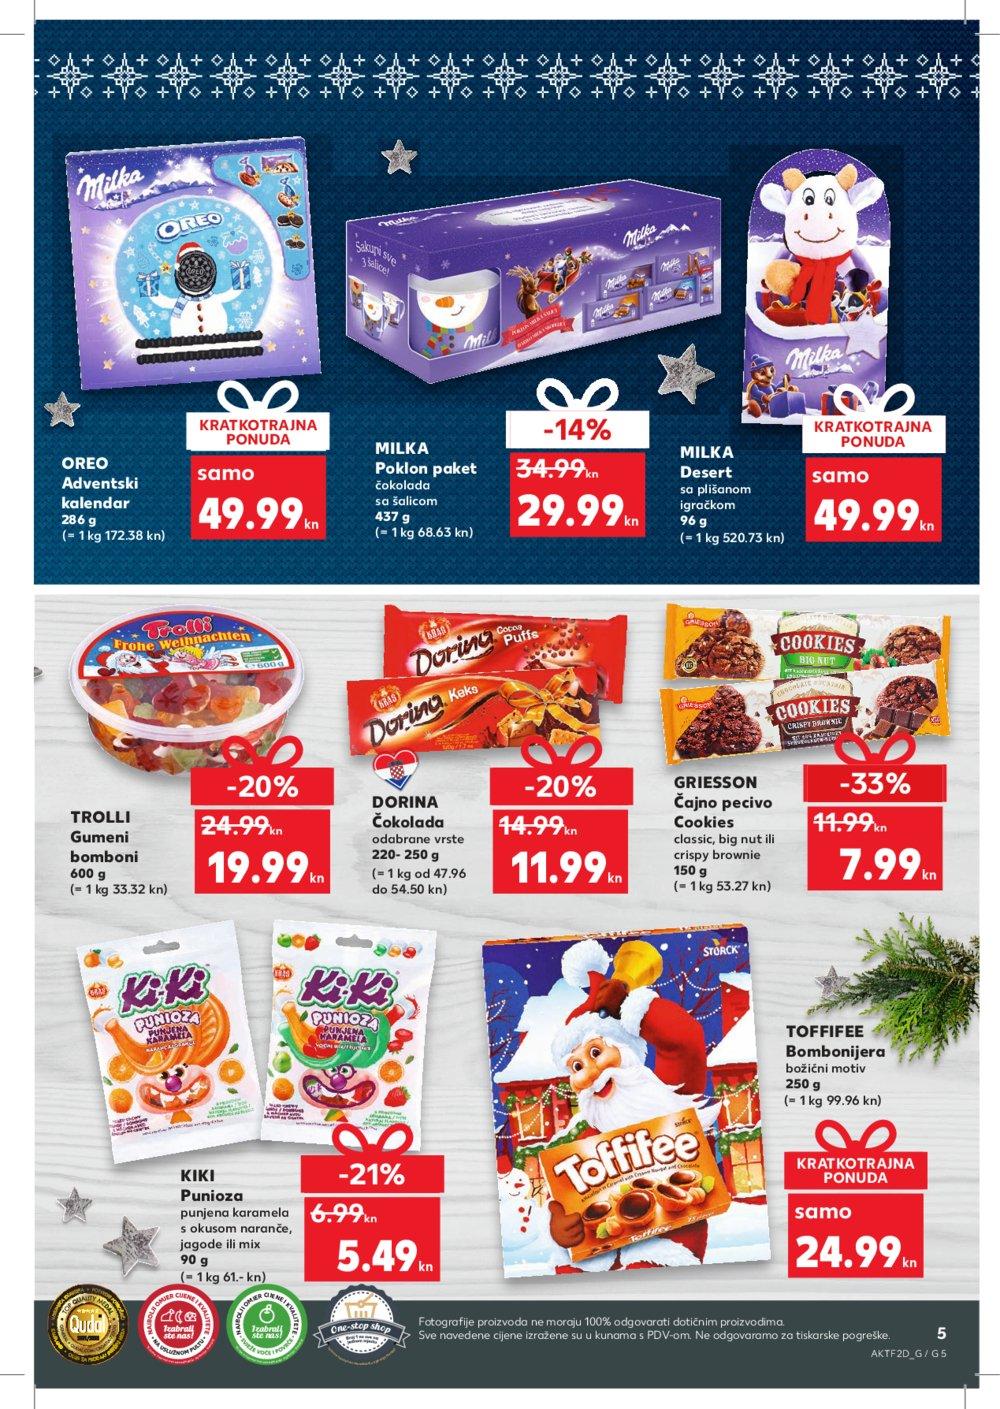 Kaufland katalog Veselimo se blagdanima 14.11.-20.11.2019.